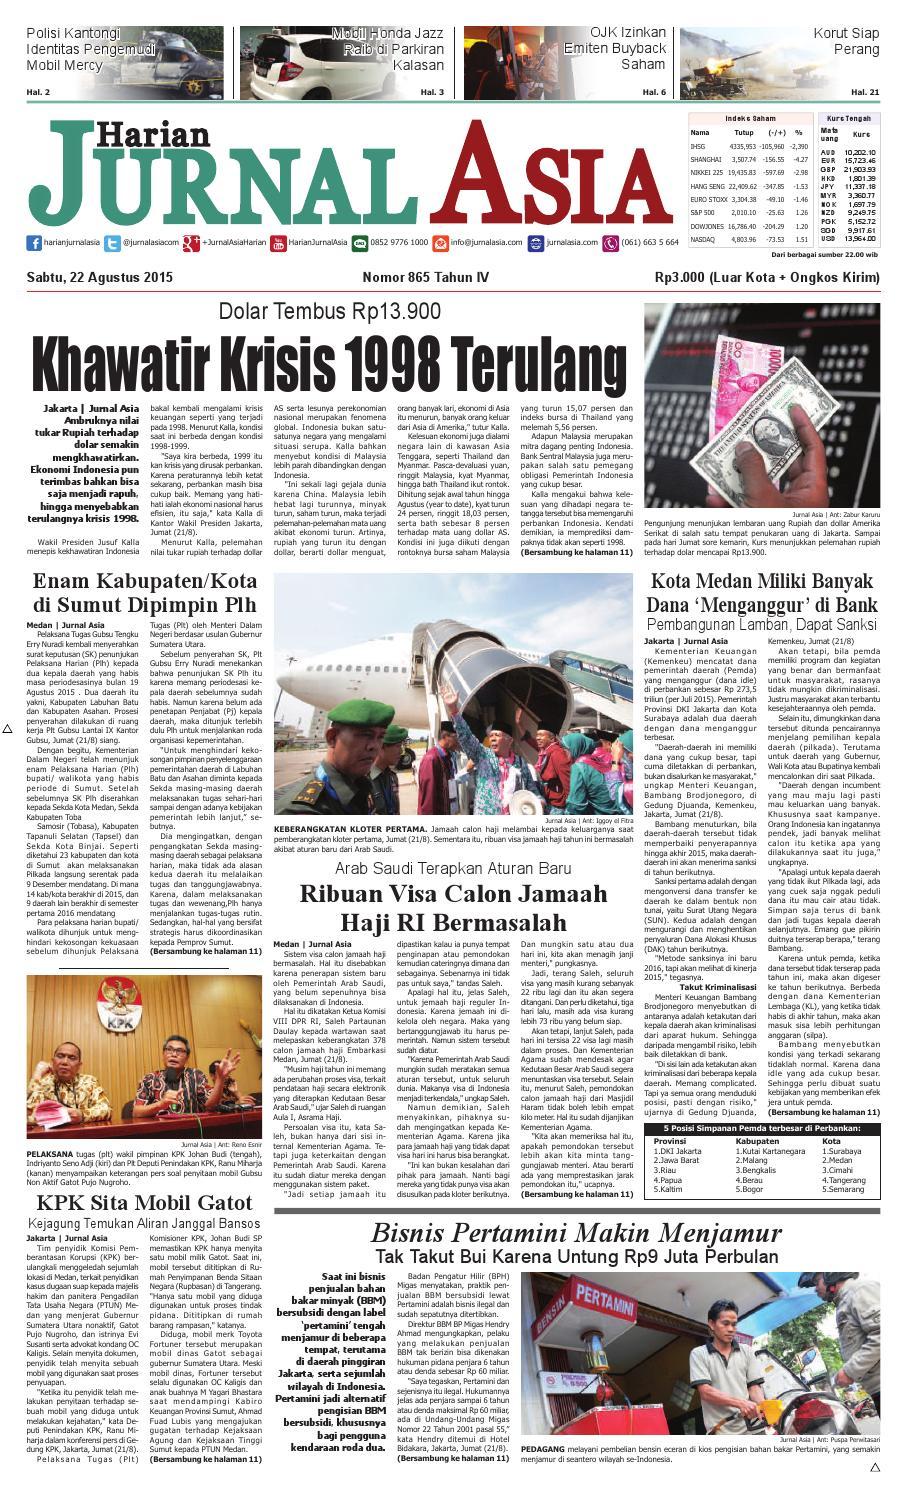 Harian Jurnal Asia Edisi Sabtu 22 Agustus 2015 By Harian